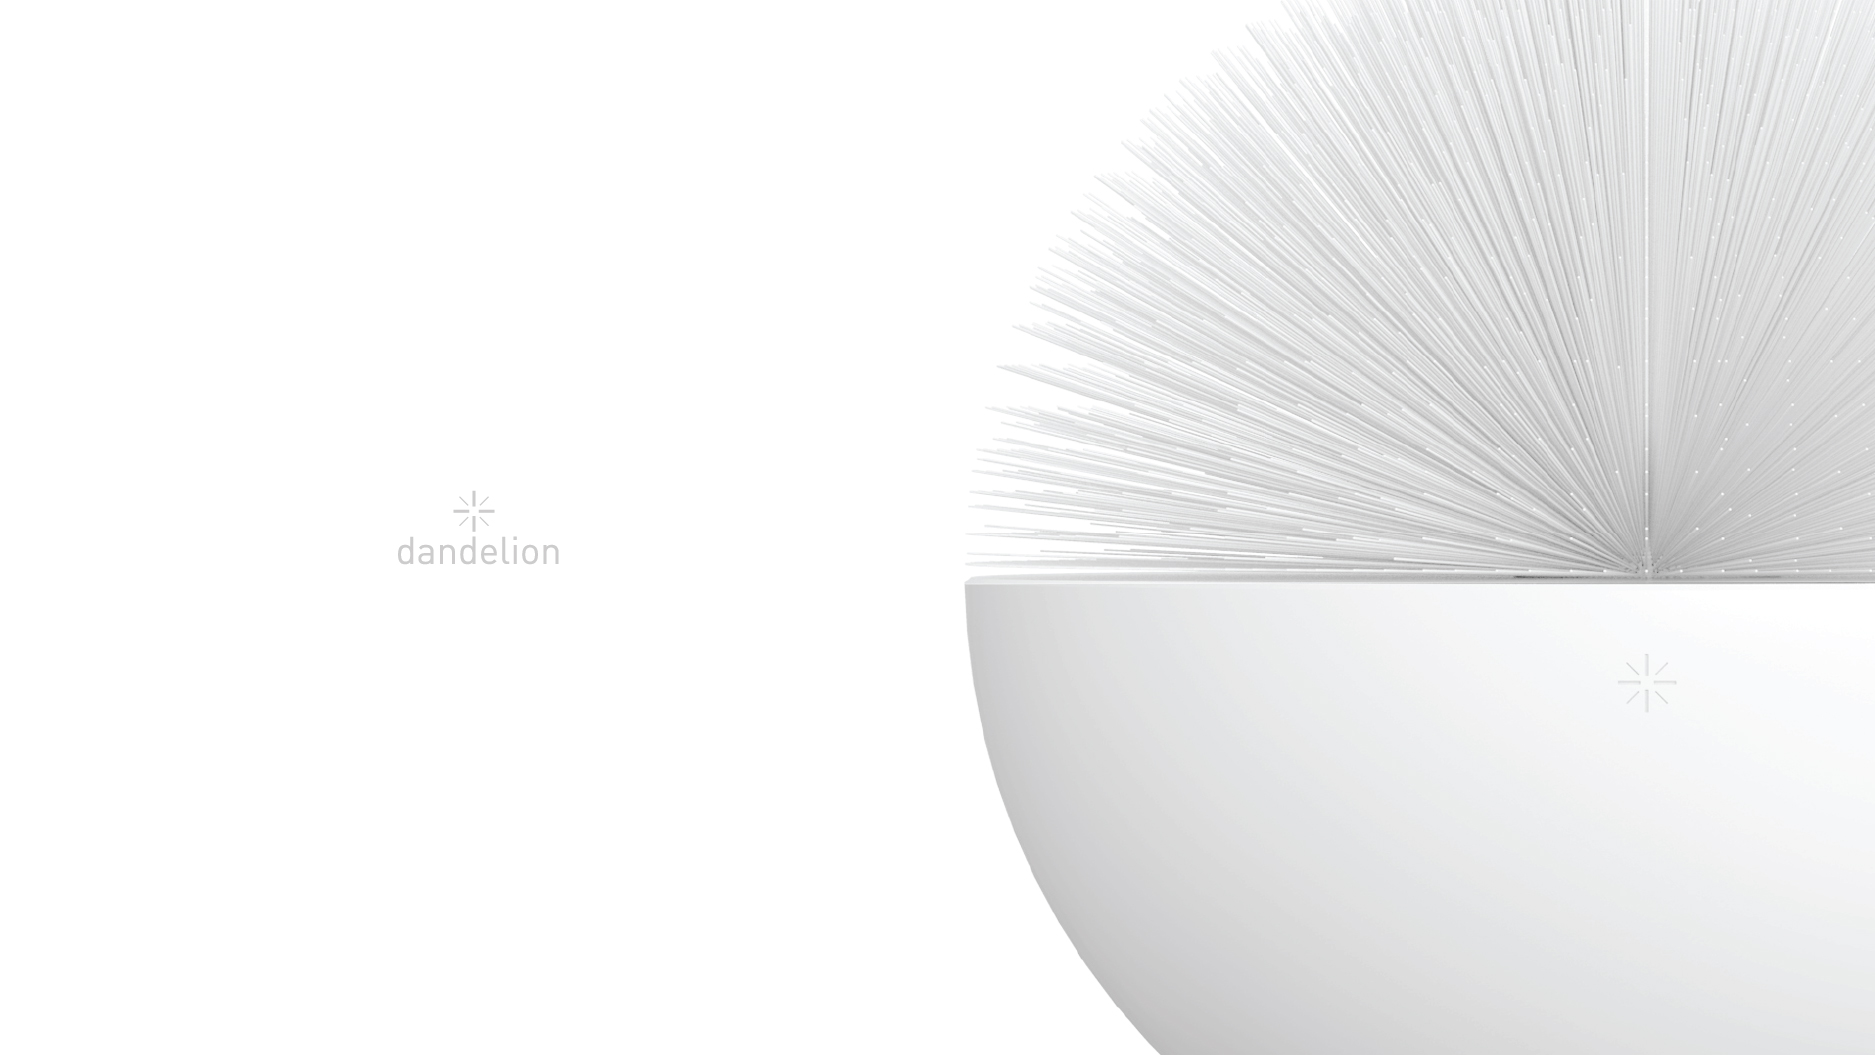 dandelion-closeup.jpg